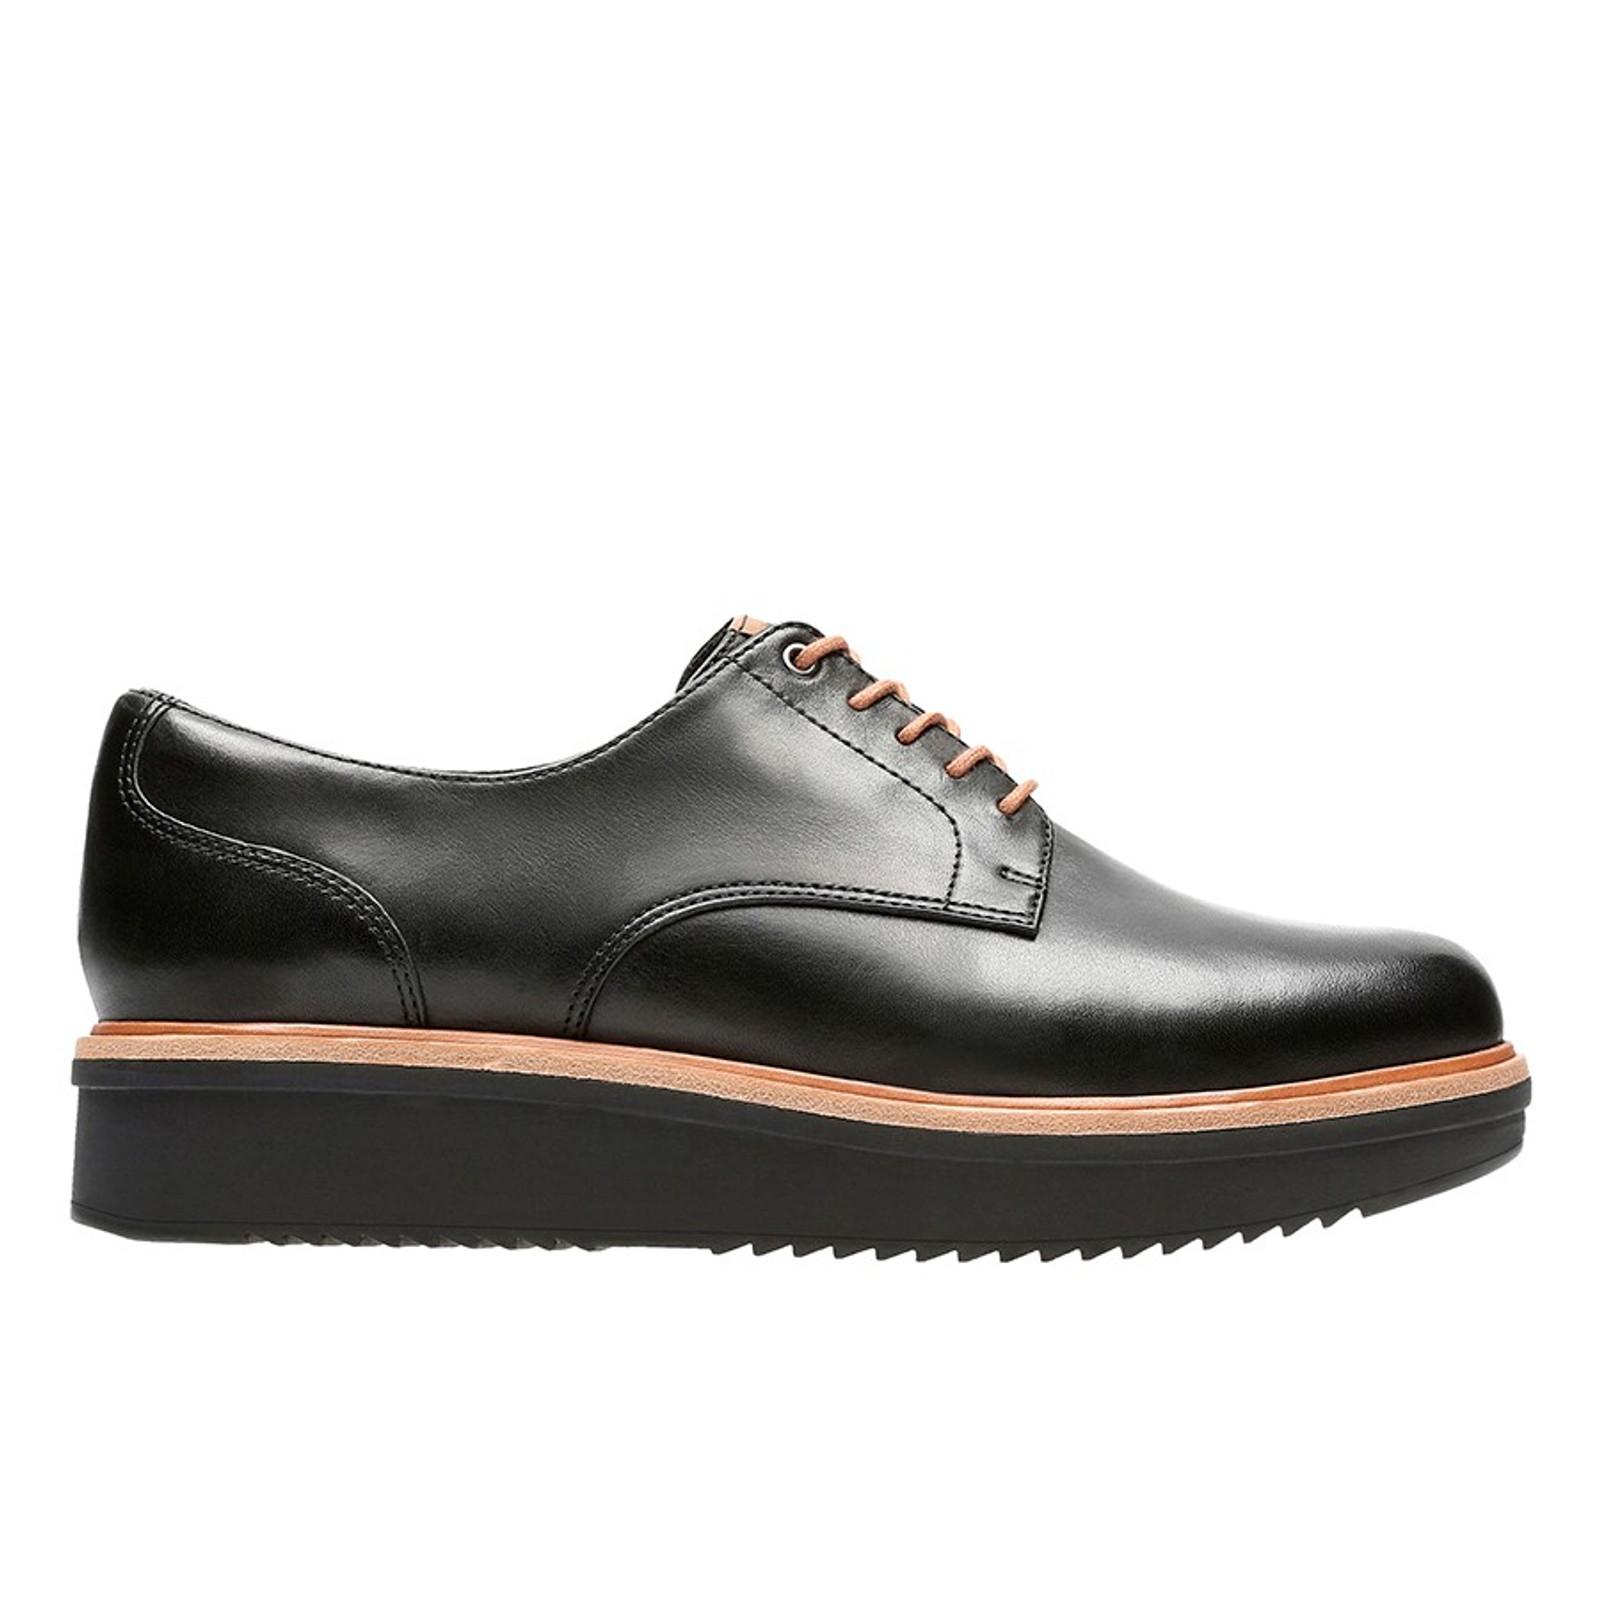 Teadale Rhea Black Leather By Clarks